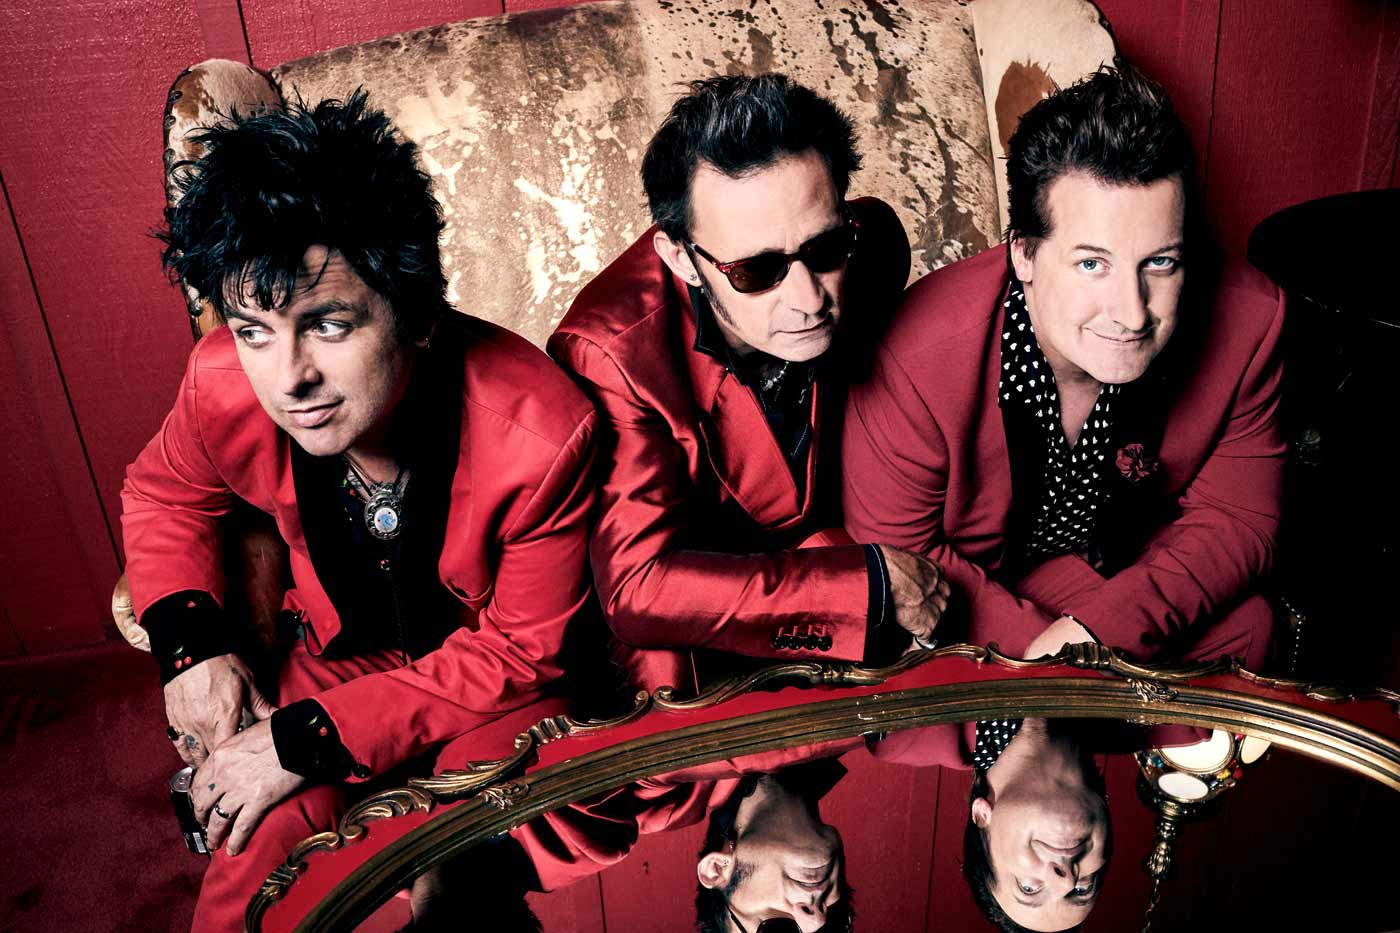 Green Day encabezará el cartel del MTV World Stage Sevilla